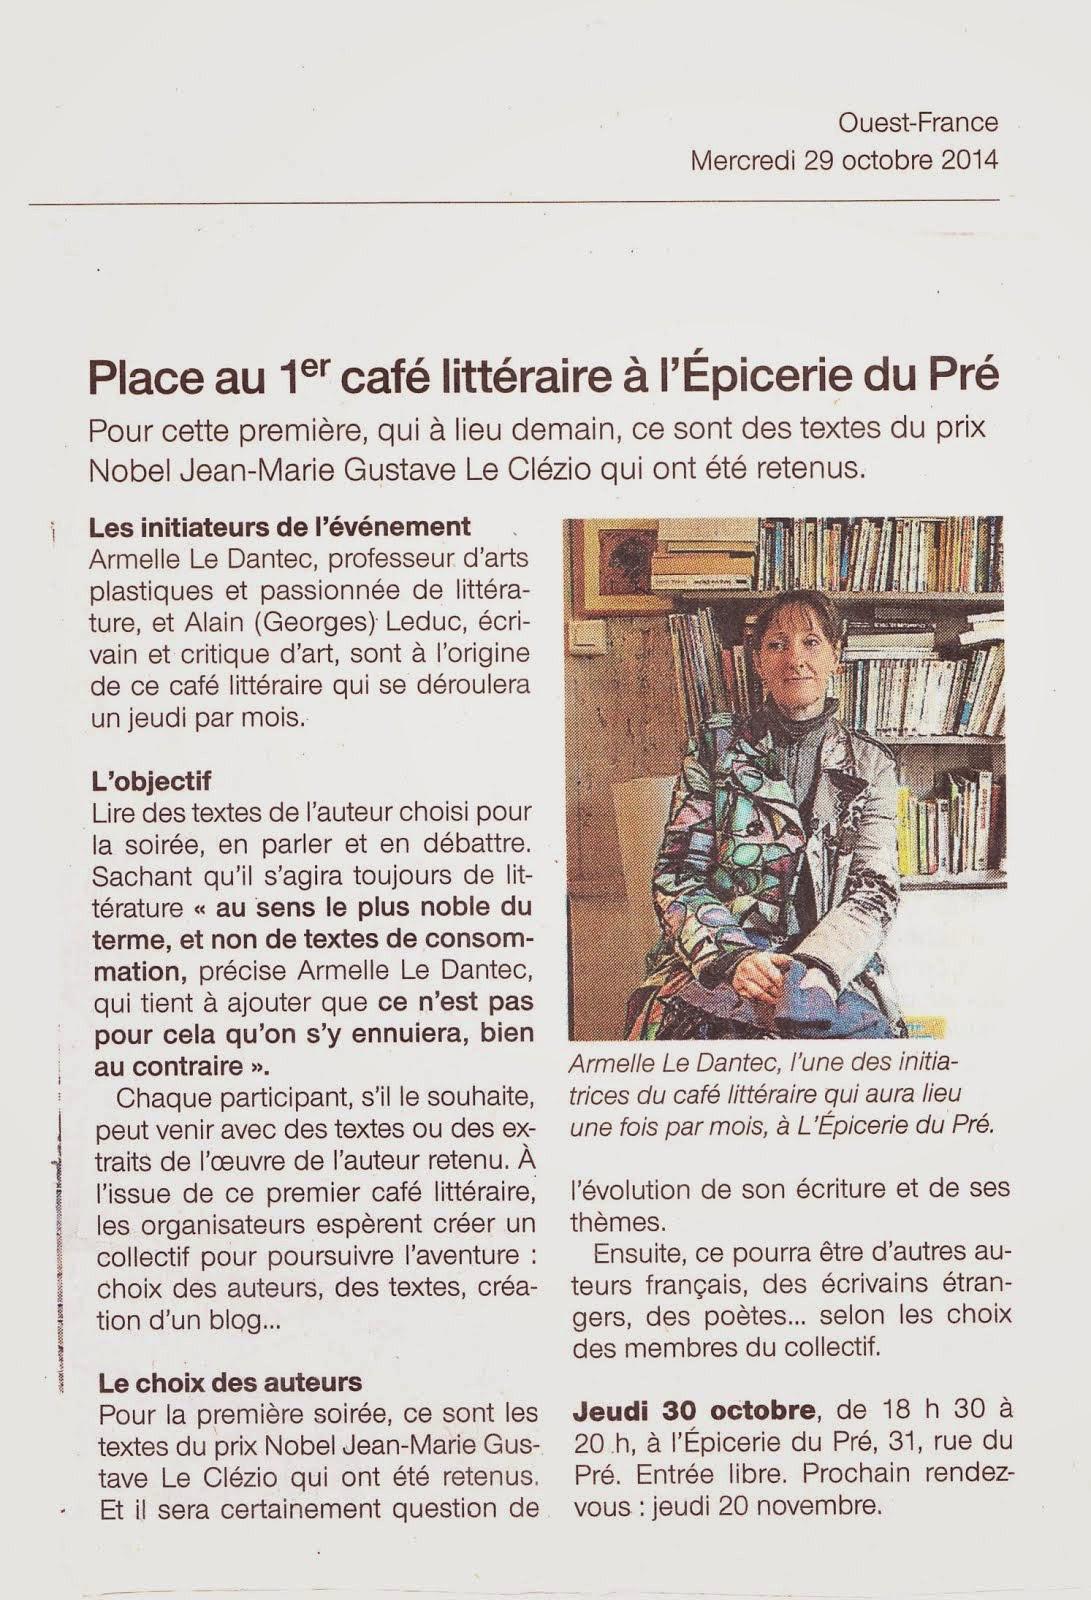 ouest-France 29 octobre 2014